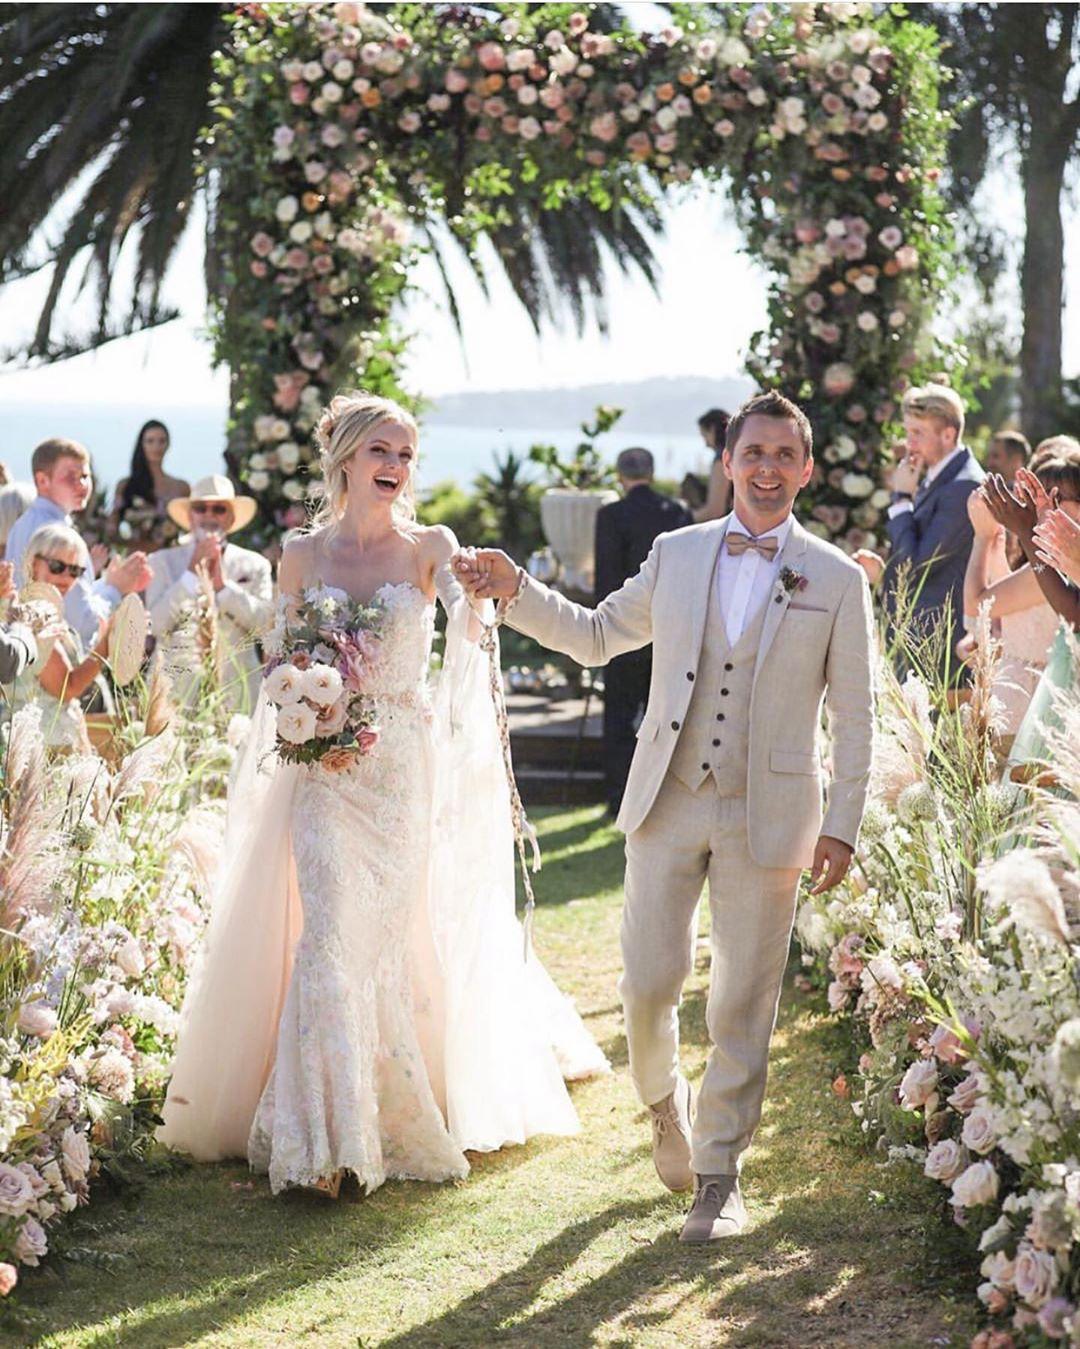 MATT_BELLAMY_WEDDING_PEOPLE.jpeg